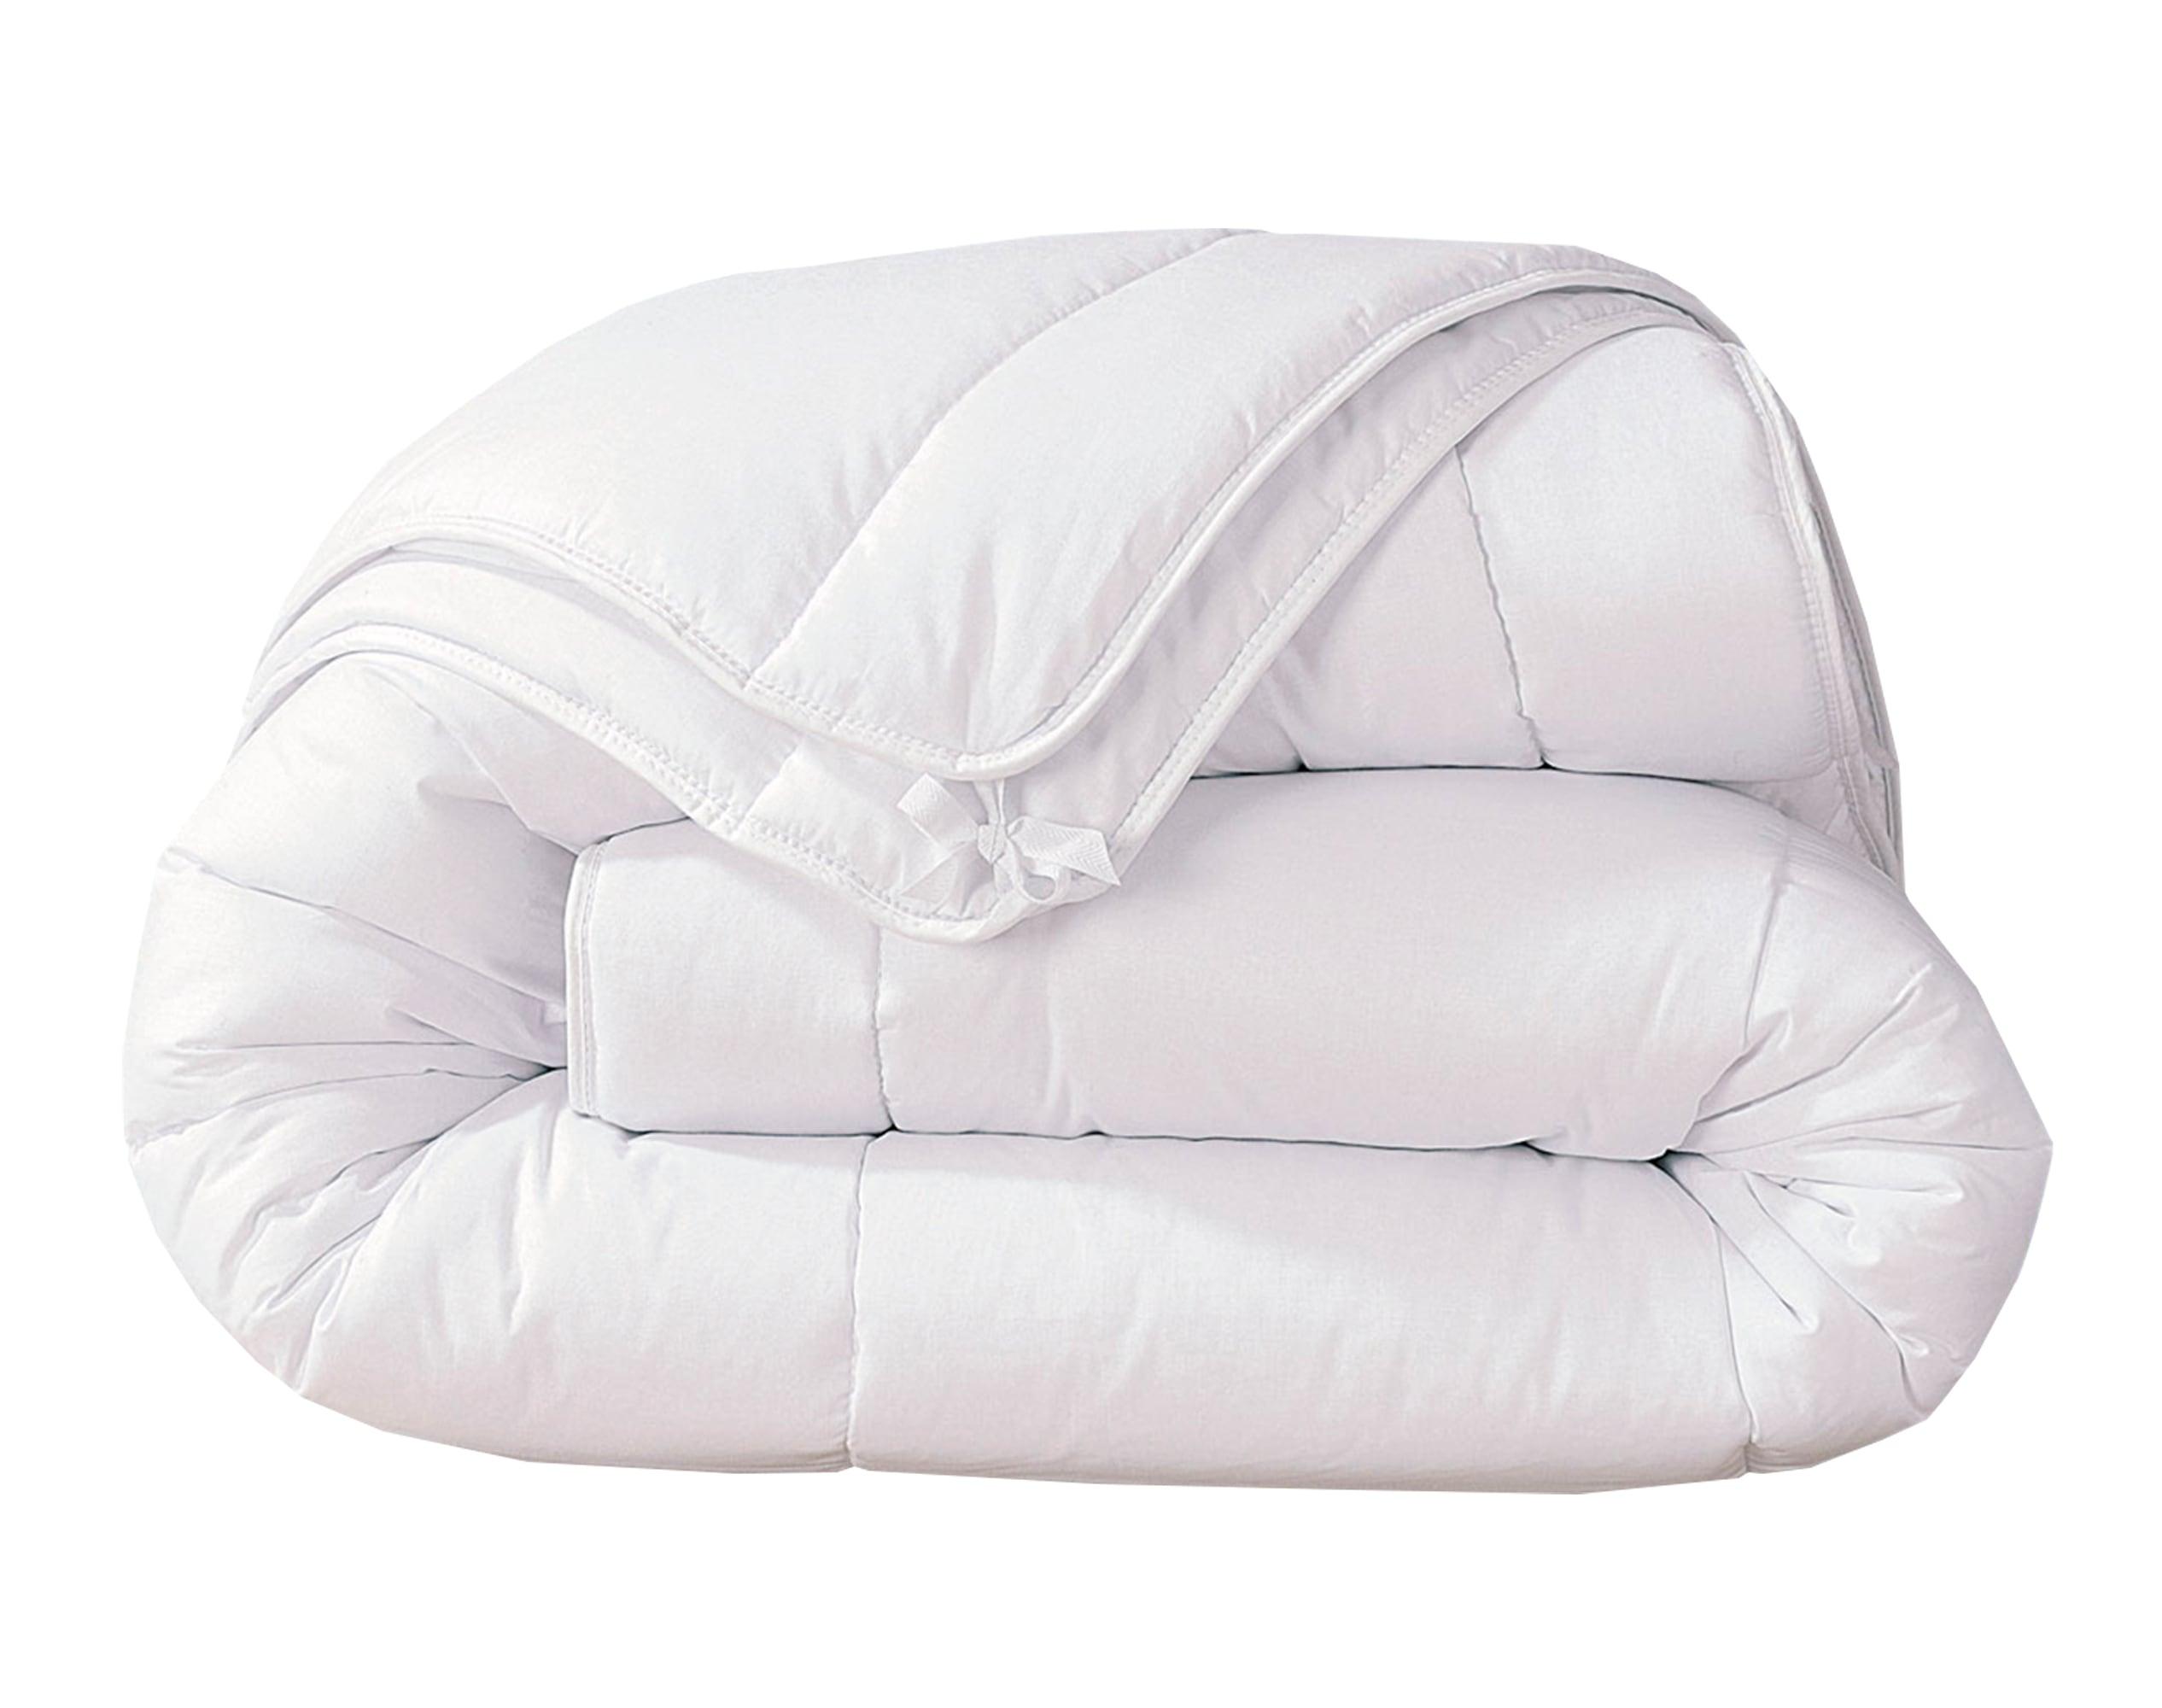 Couette 4 saisons 140x200 blanche en polyester 200+300 g/m²